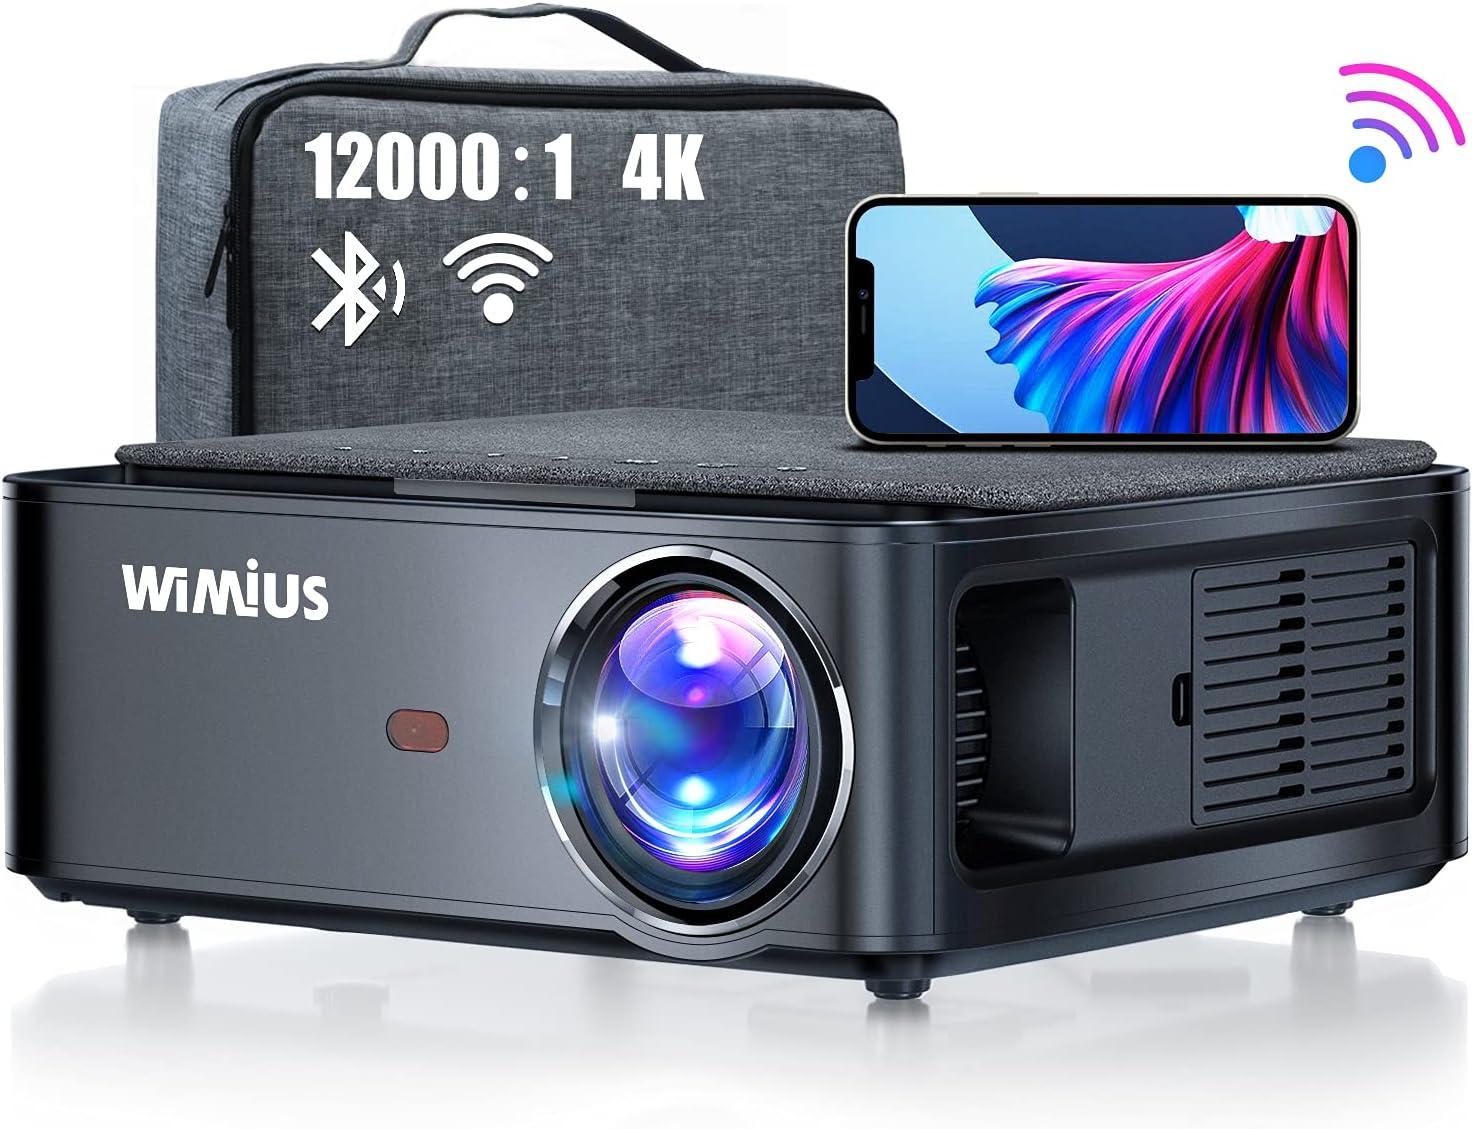 Projector, WiMiUS Newest 5G WiFi Bluetooth Projector Native 1920x1080 LED Projector 4K Support 5.1 Bluetooth 4P/4D Keystone, Zoom 500